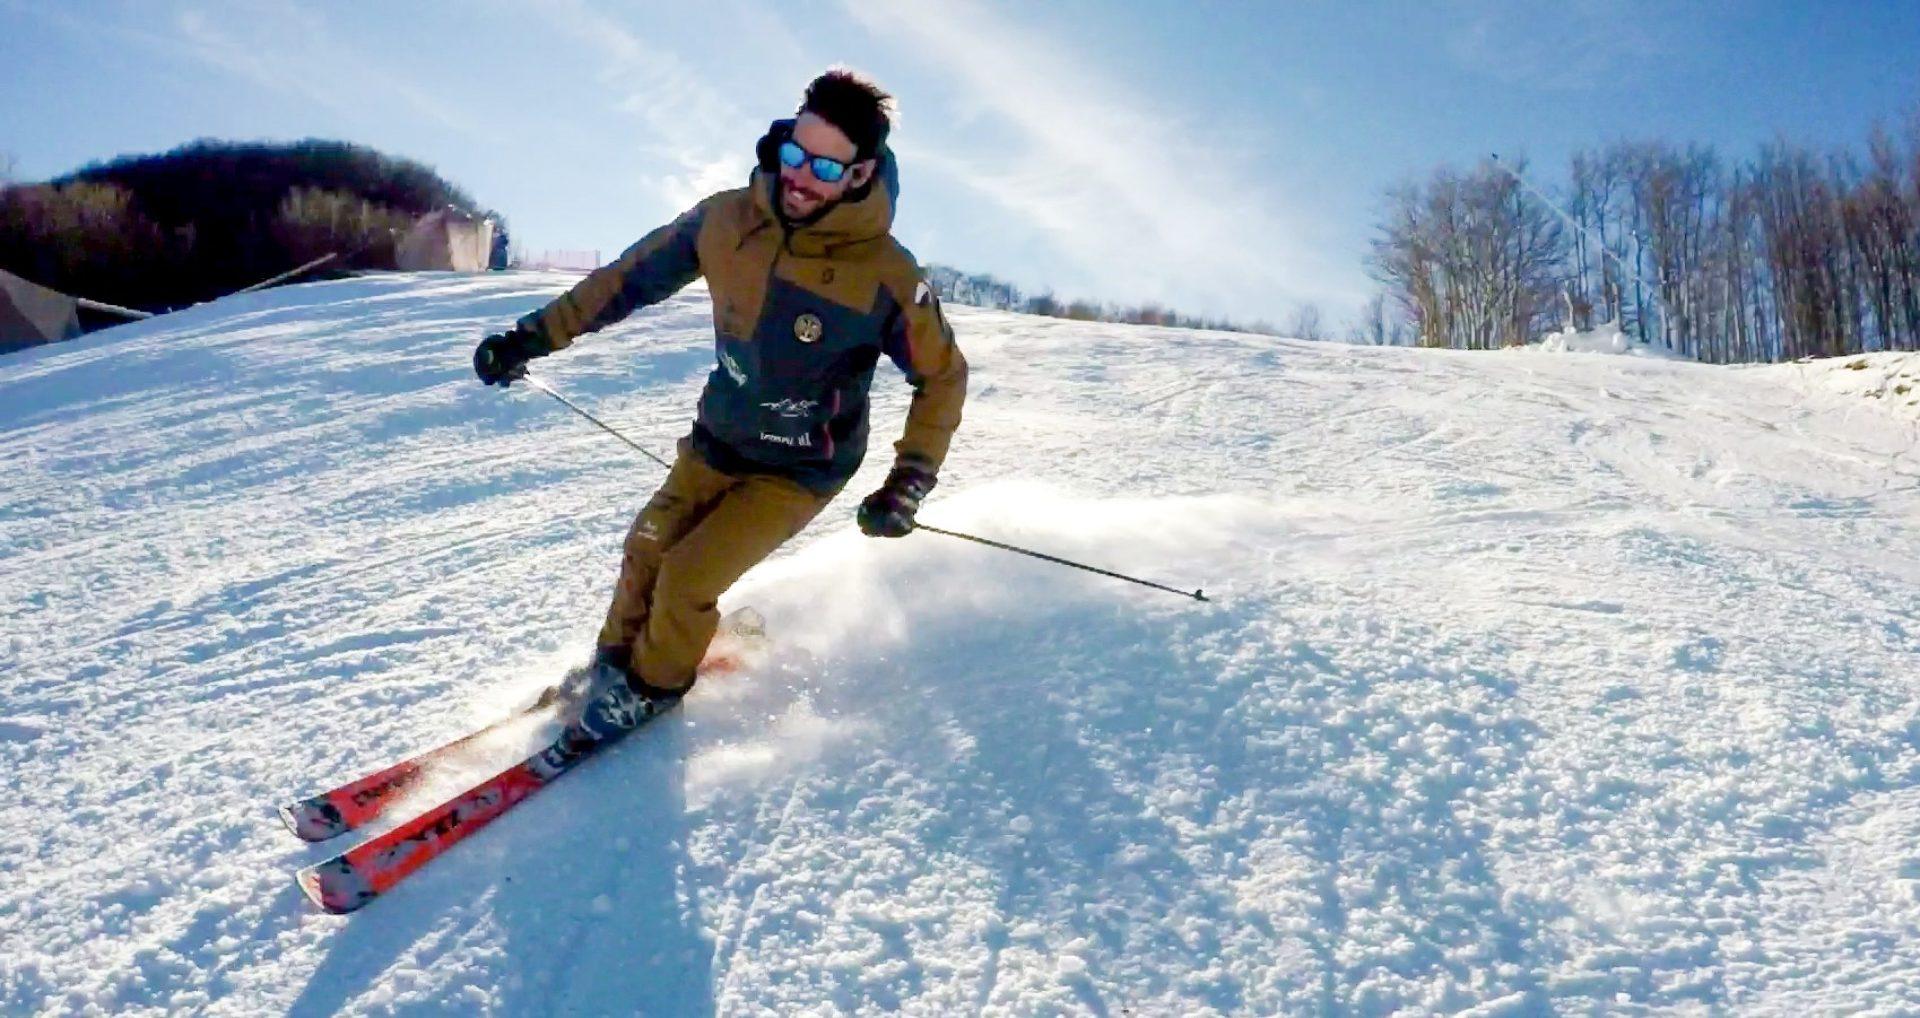 Lezioni di sci Emilia Romagna